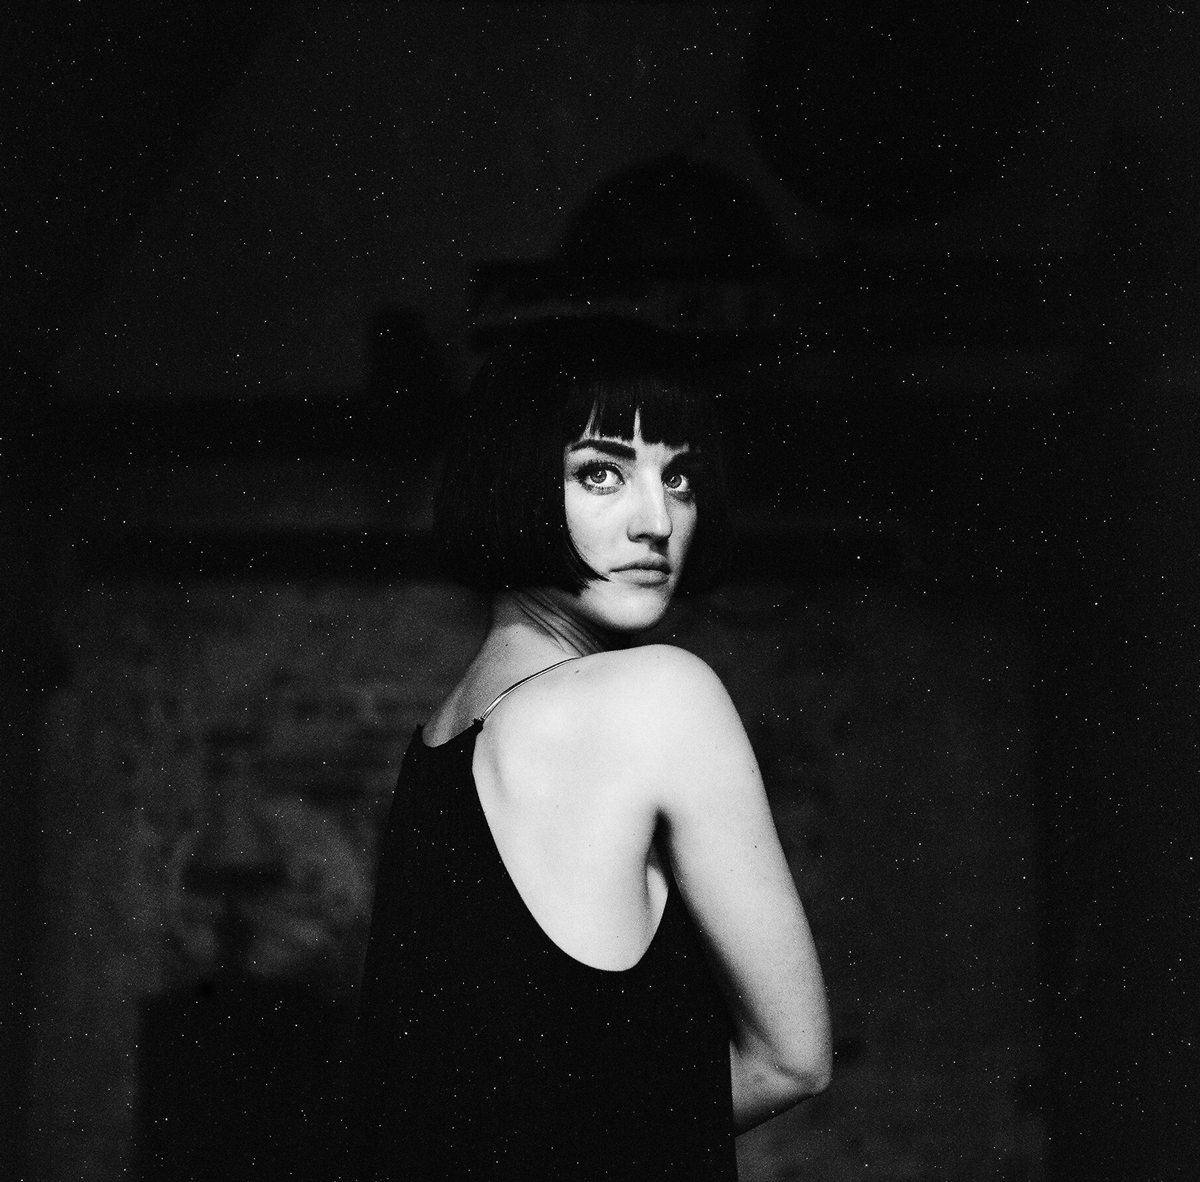 Oli Sansom: Falling in Love with & Mastering Expired Film, portrait, australia, photography, melbourne, dark, dan o'day & Dre portrait 3